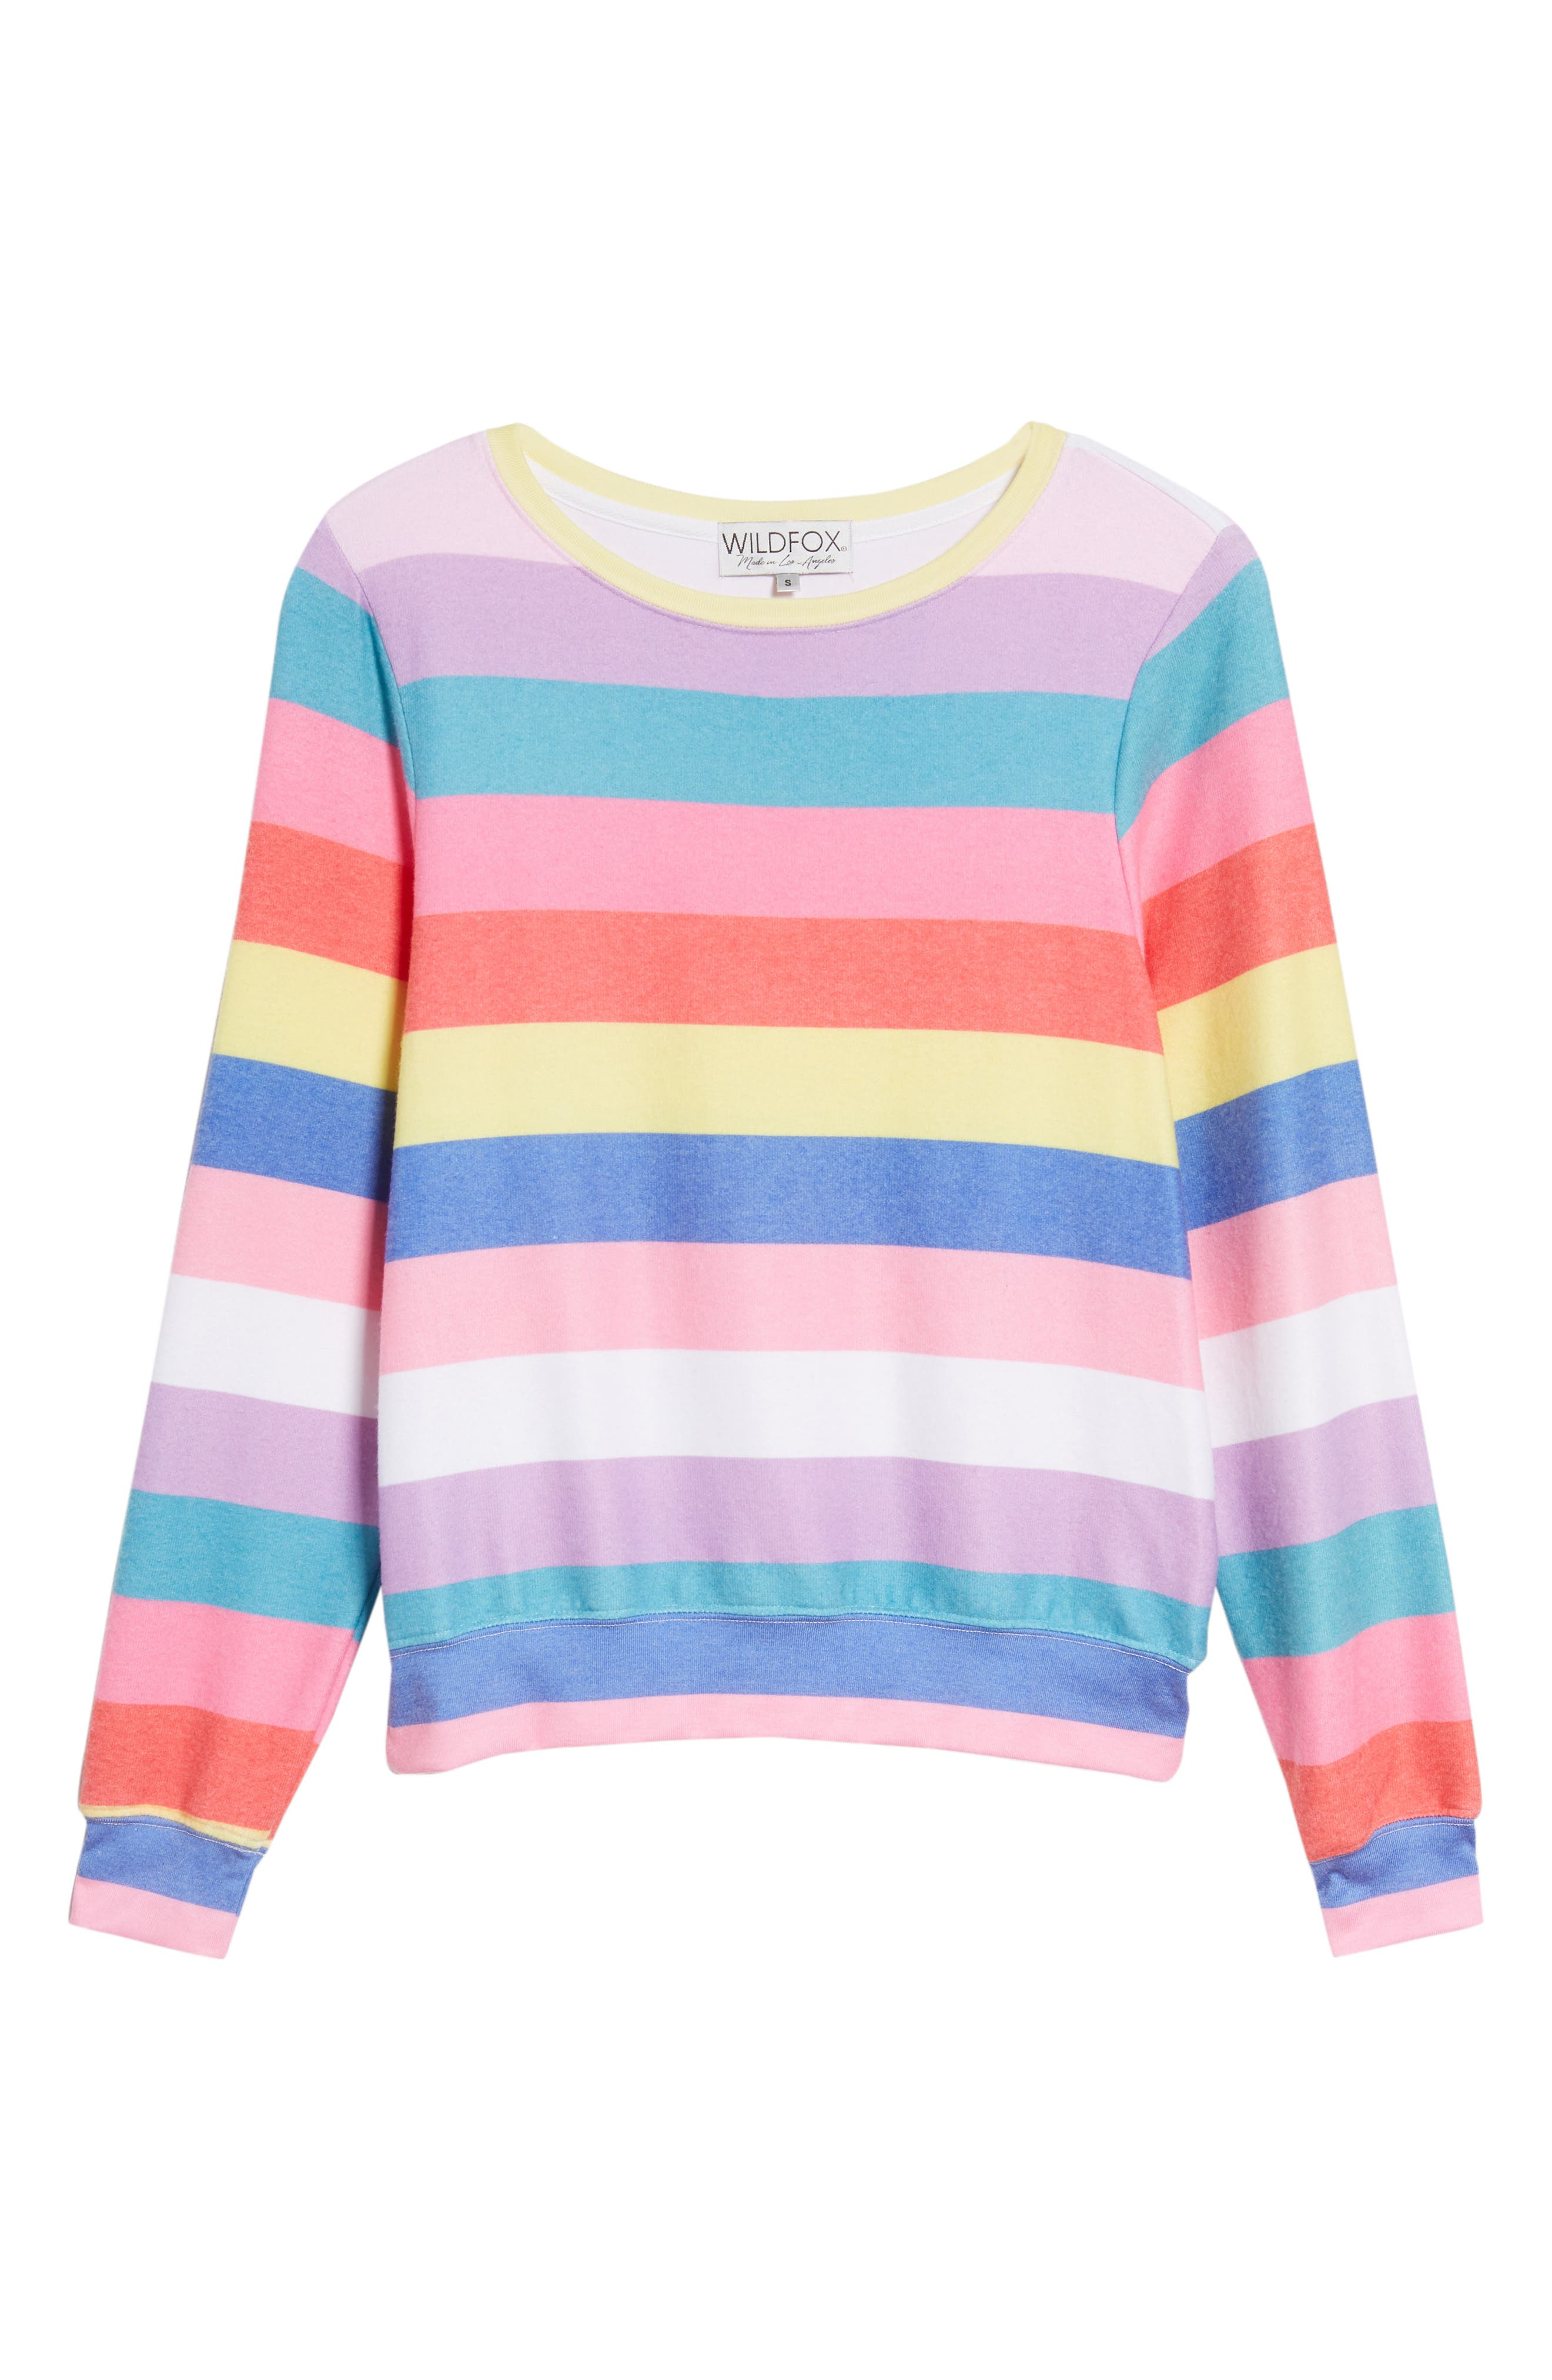 Castaway Roadtrip Sweatshirt,                             Alternate thumbnail 6, color,